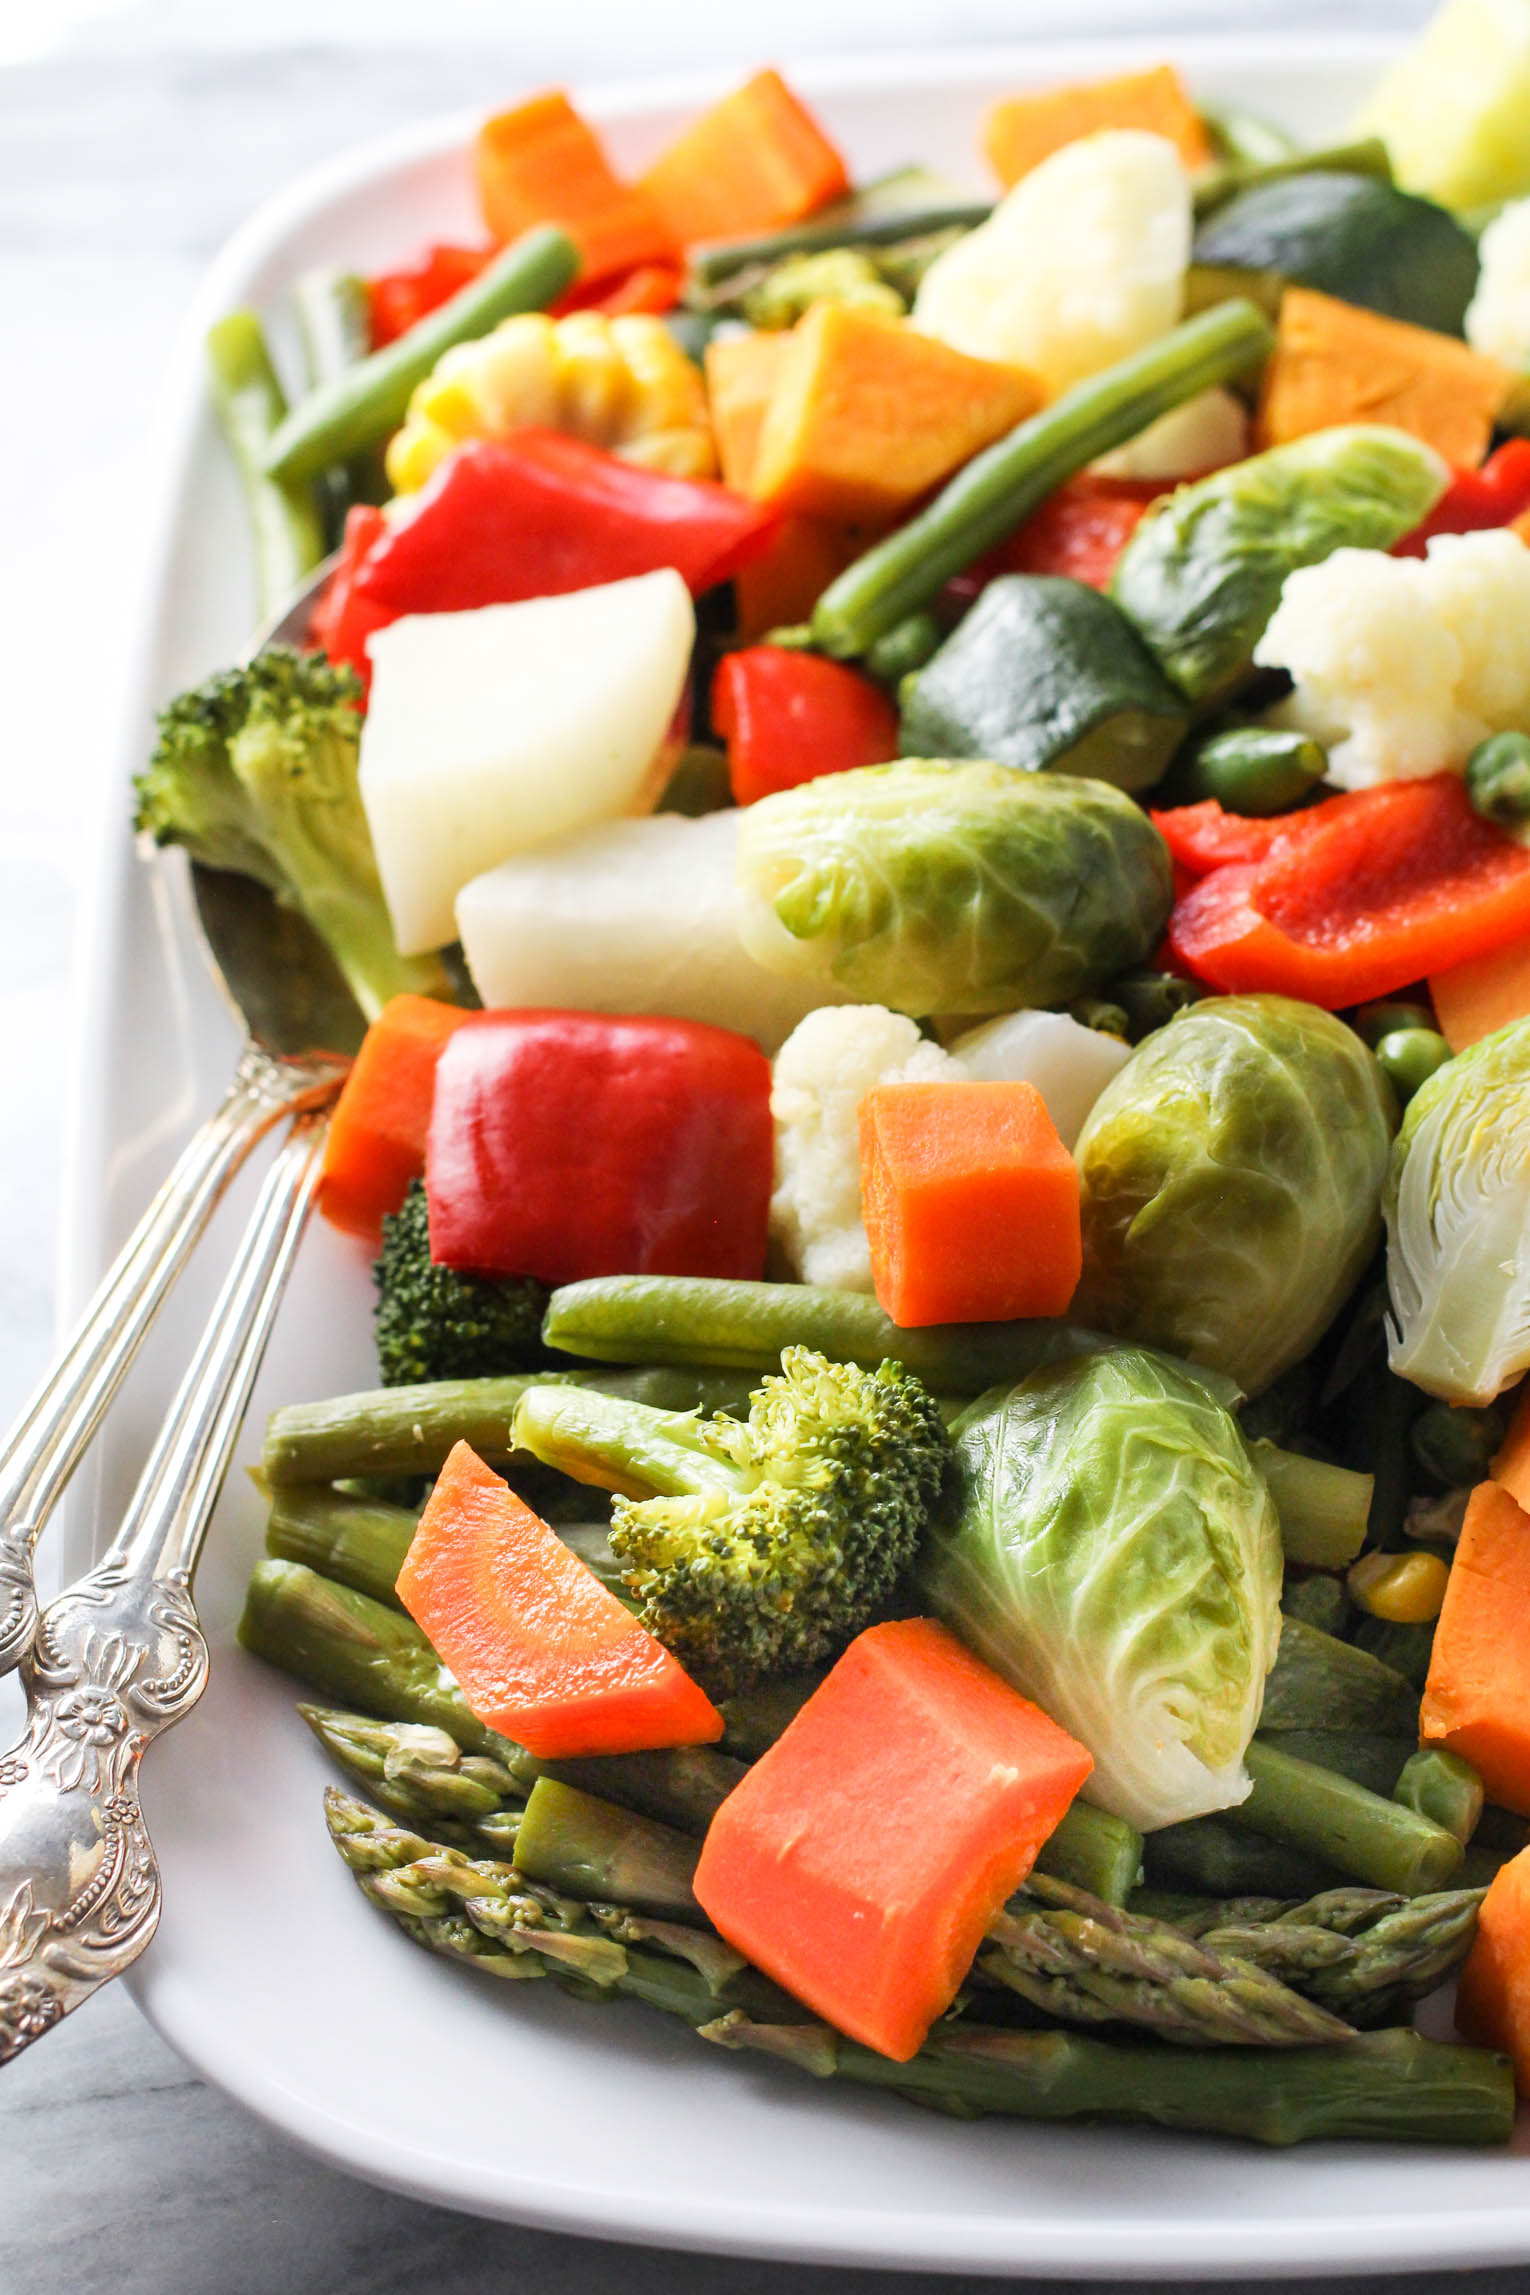 Steamed vegetables on a white platter.